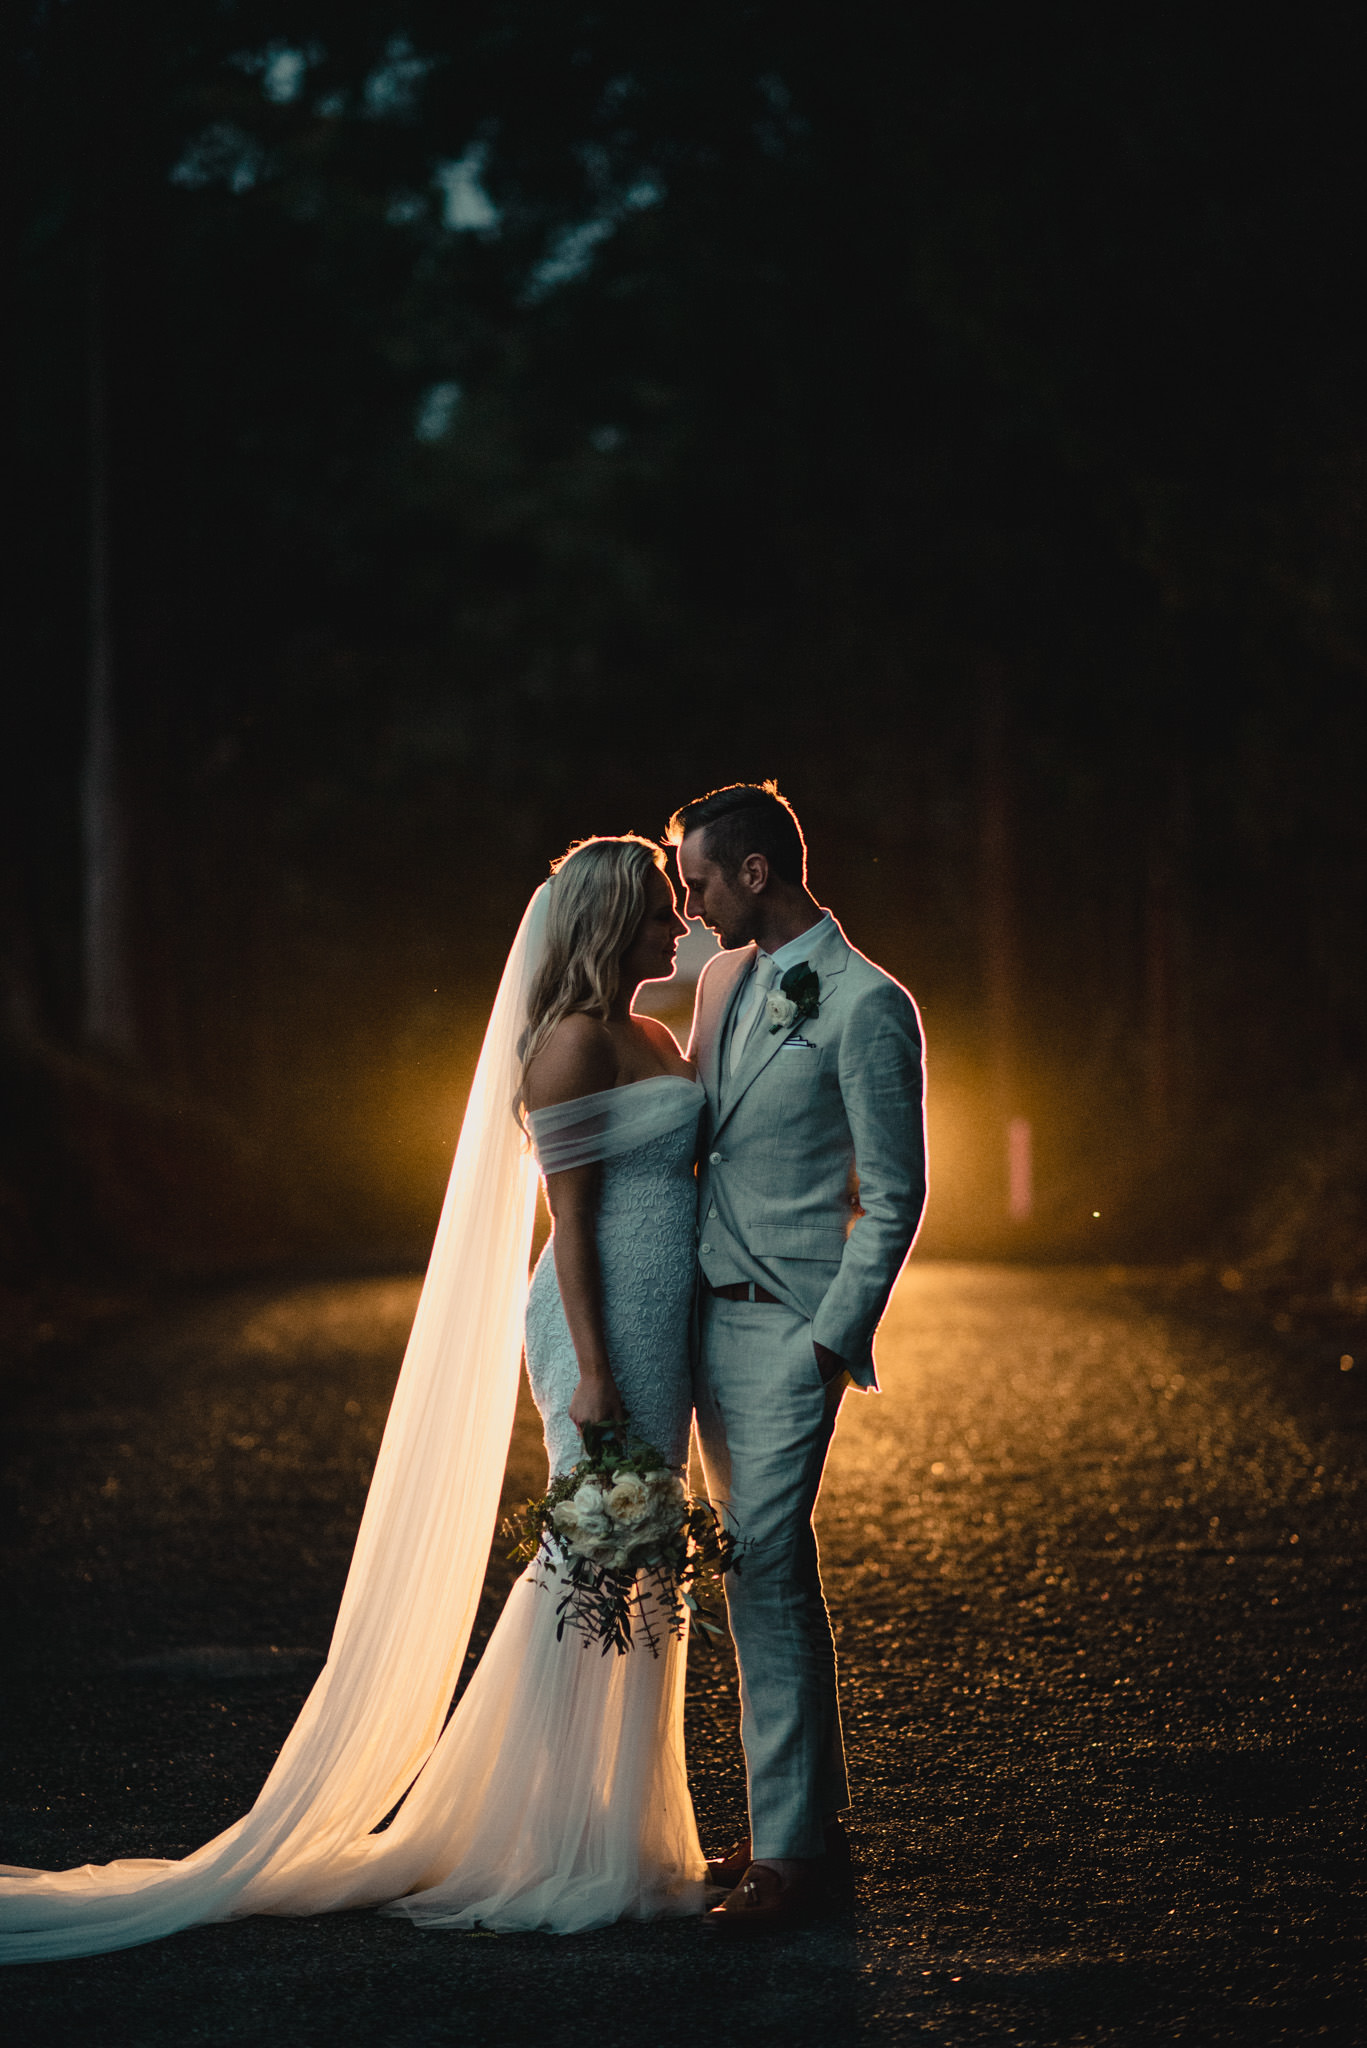 New-Black-Studios_Adam-Ward-Wedding-Photographer2.jpg